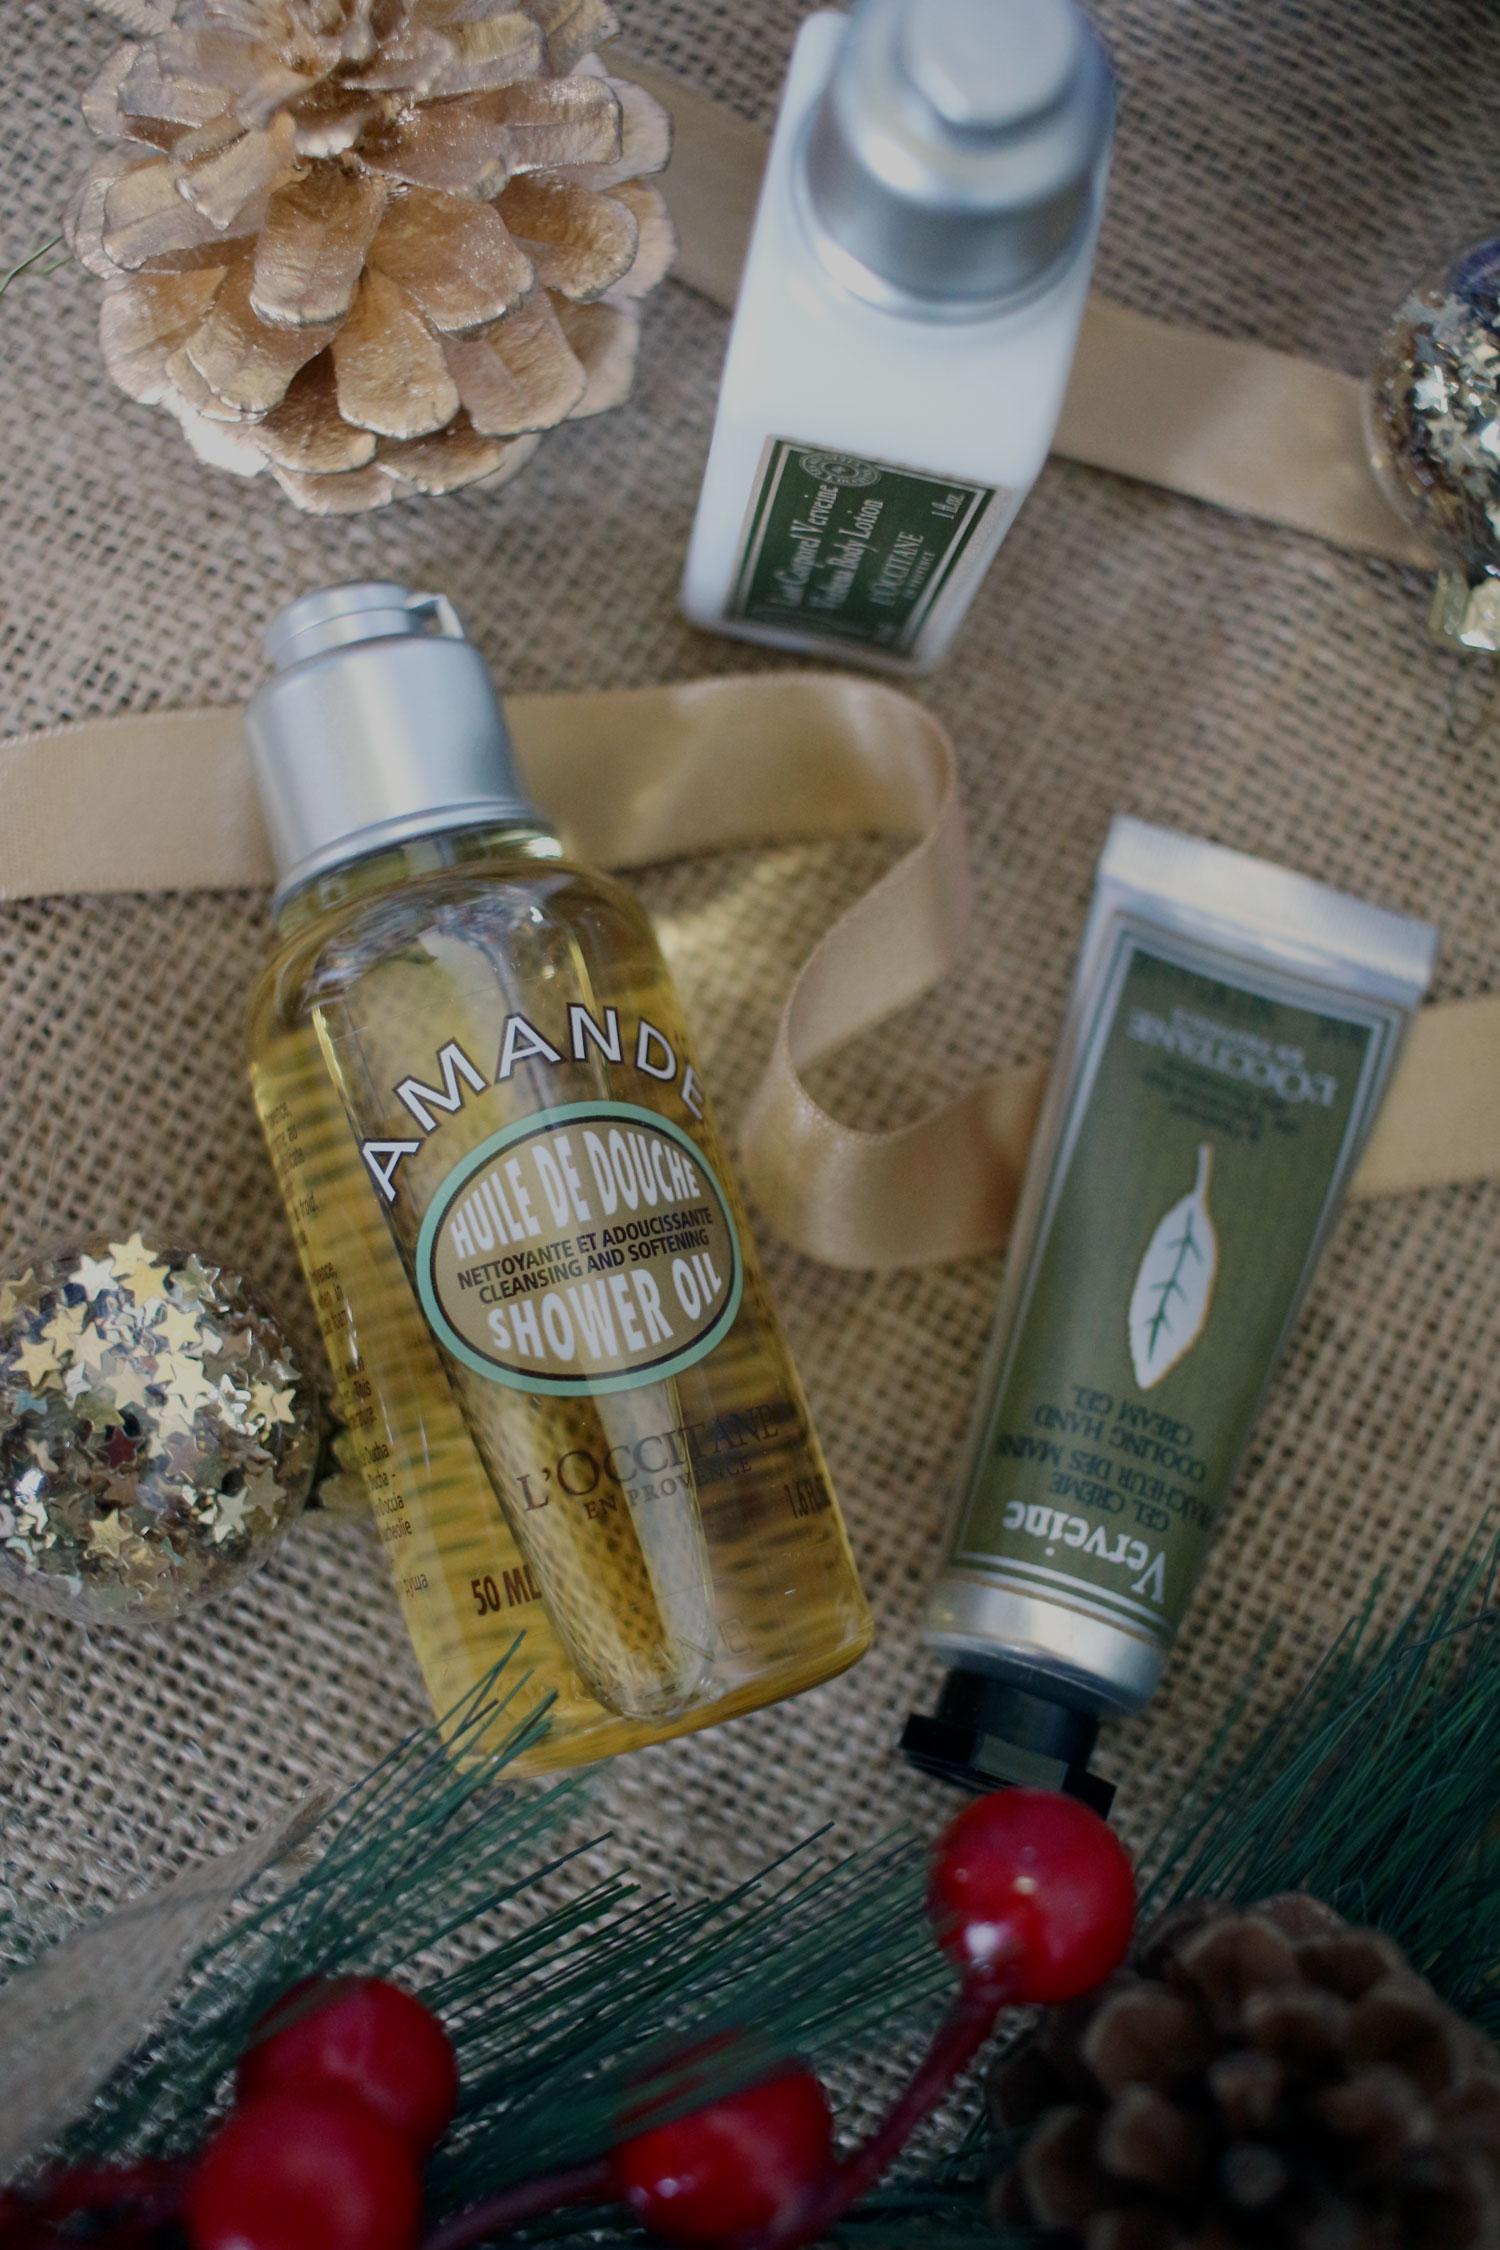 Loccitane-beauty-advent-calendar-2021-review-4